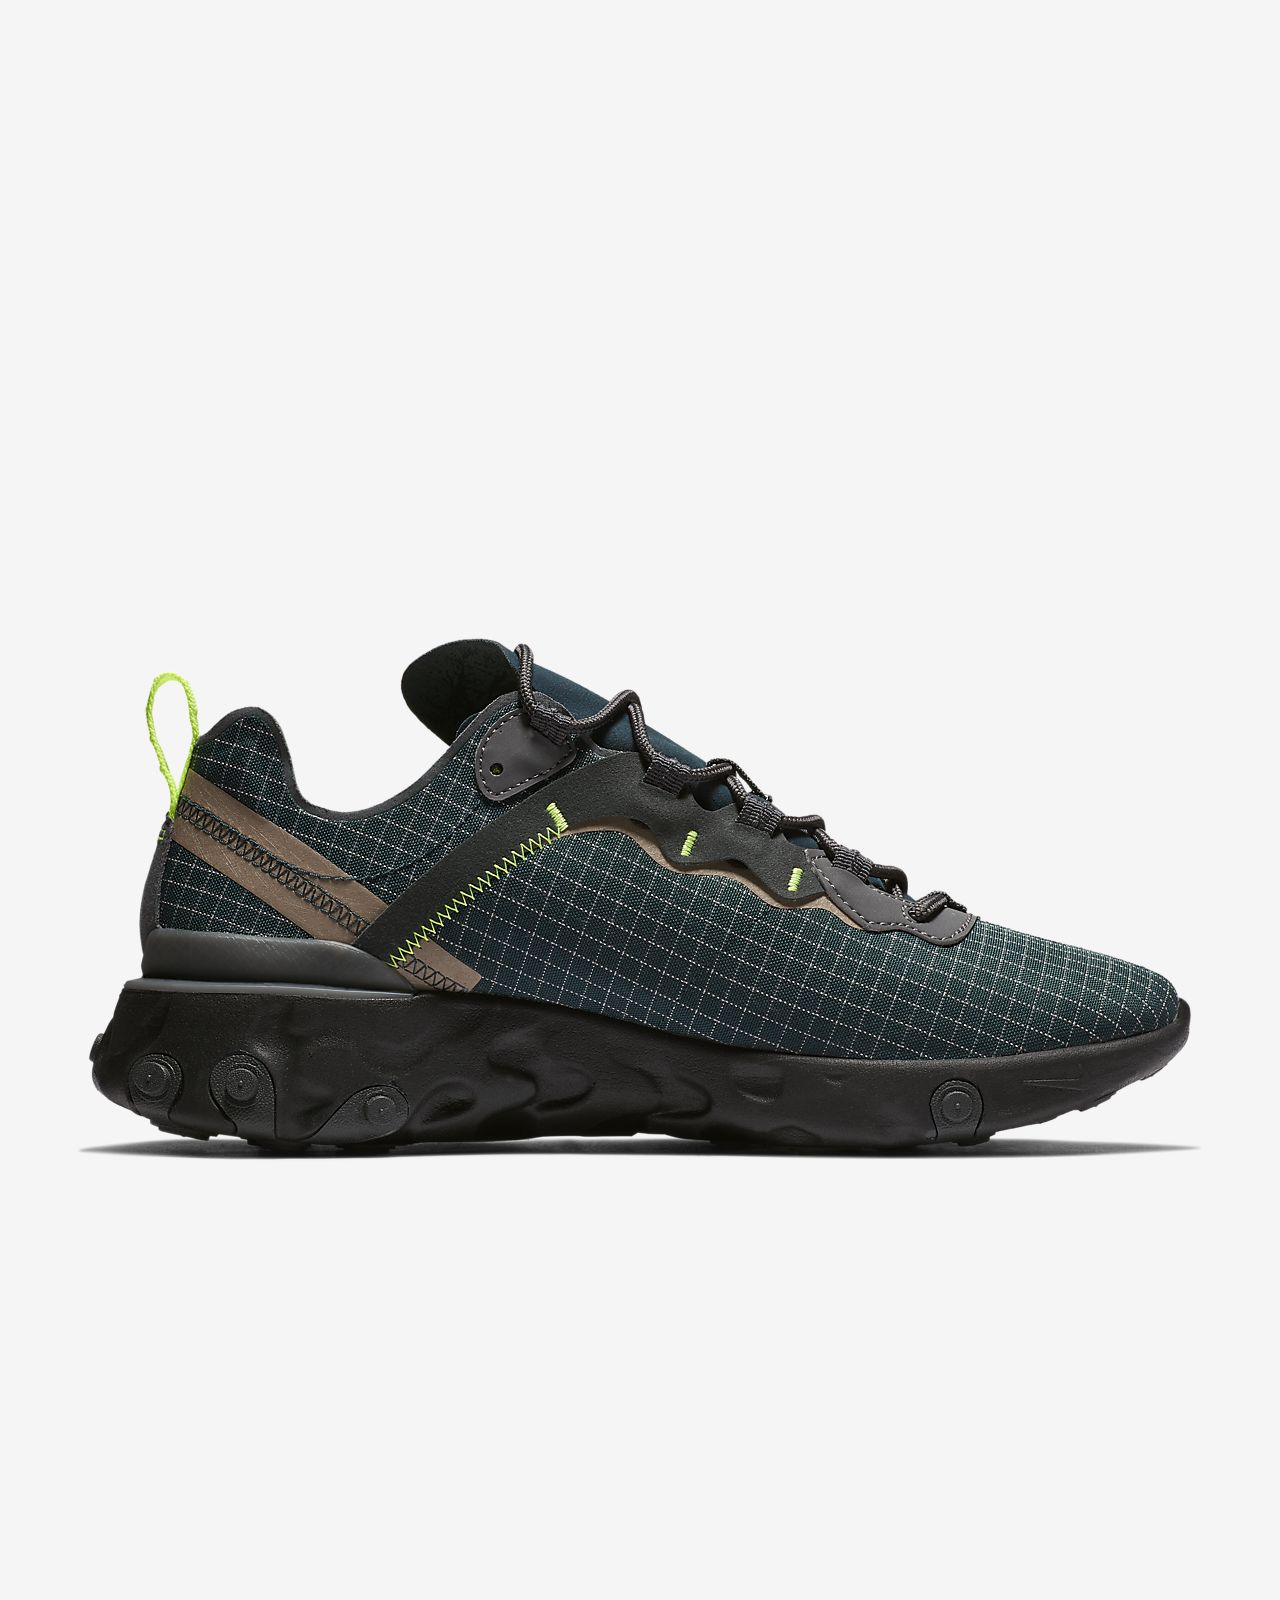 React Chaussure HommeFr Element Pour Nike 55 RqAj3L54